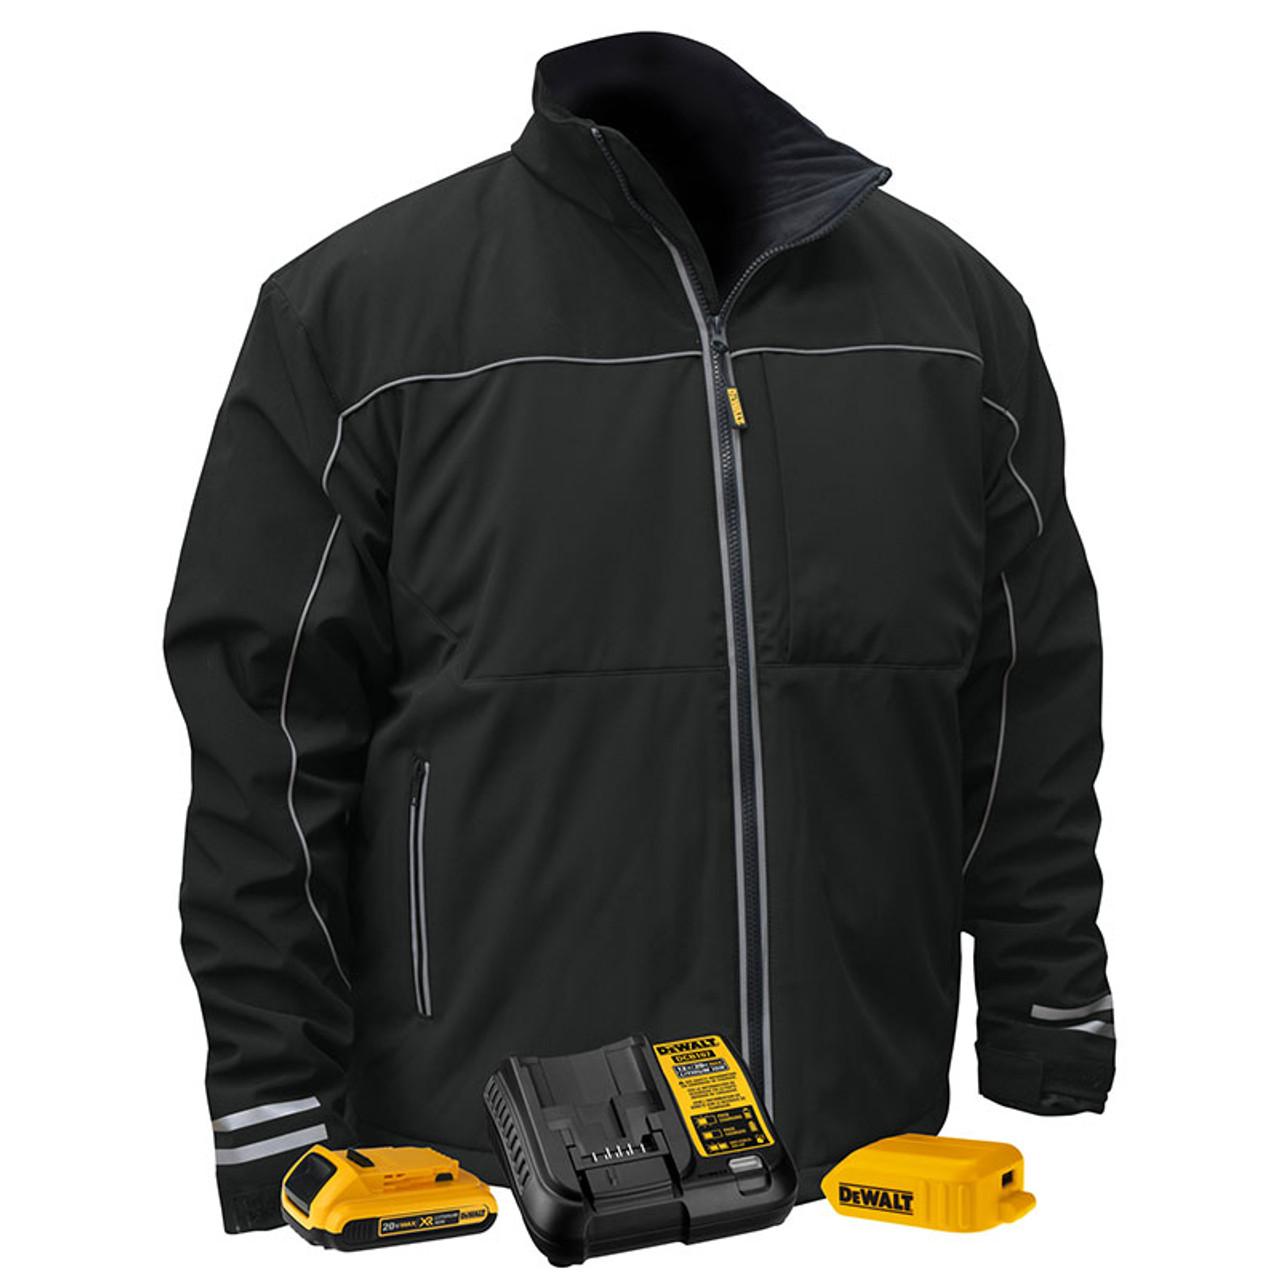 Dewalt Heated Lightweight Soft Shell Black Work Jacket Kit Dchj072d1